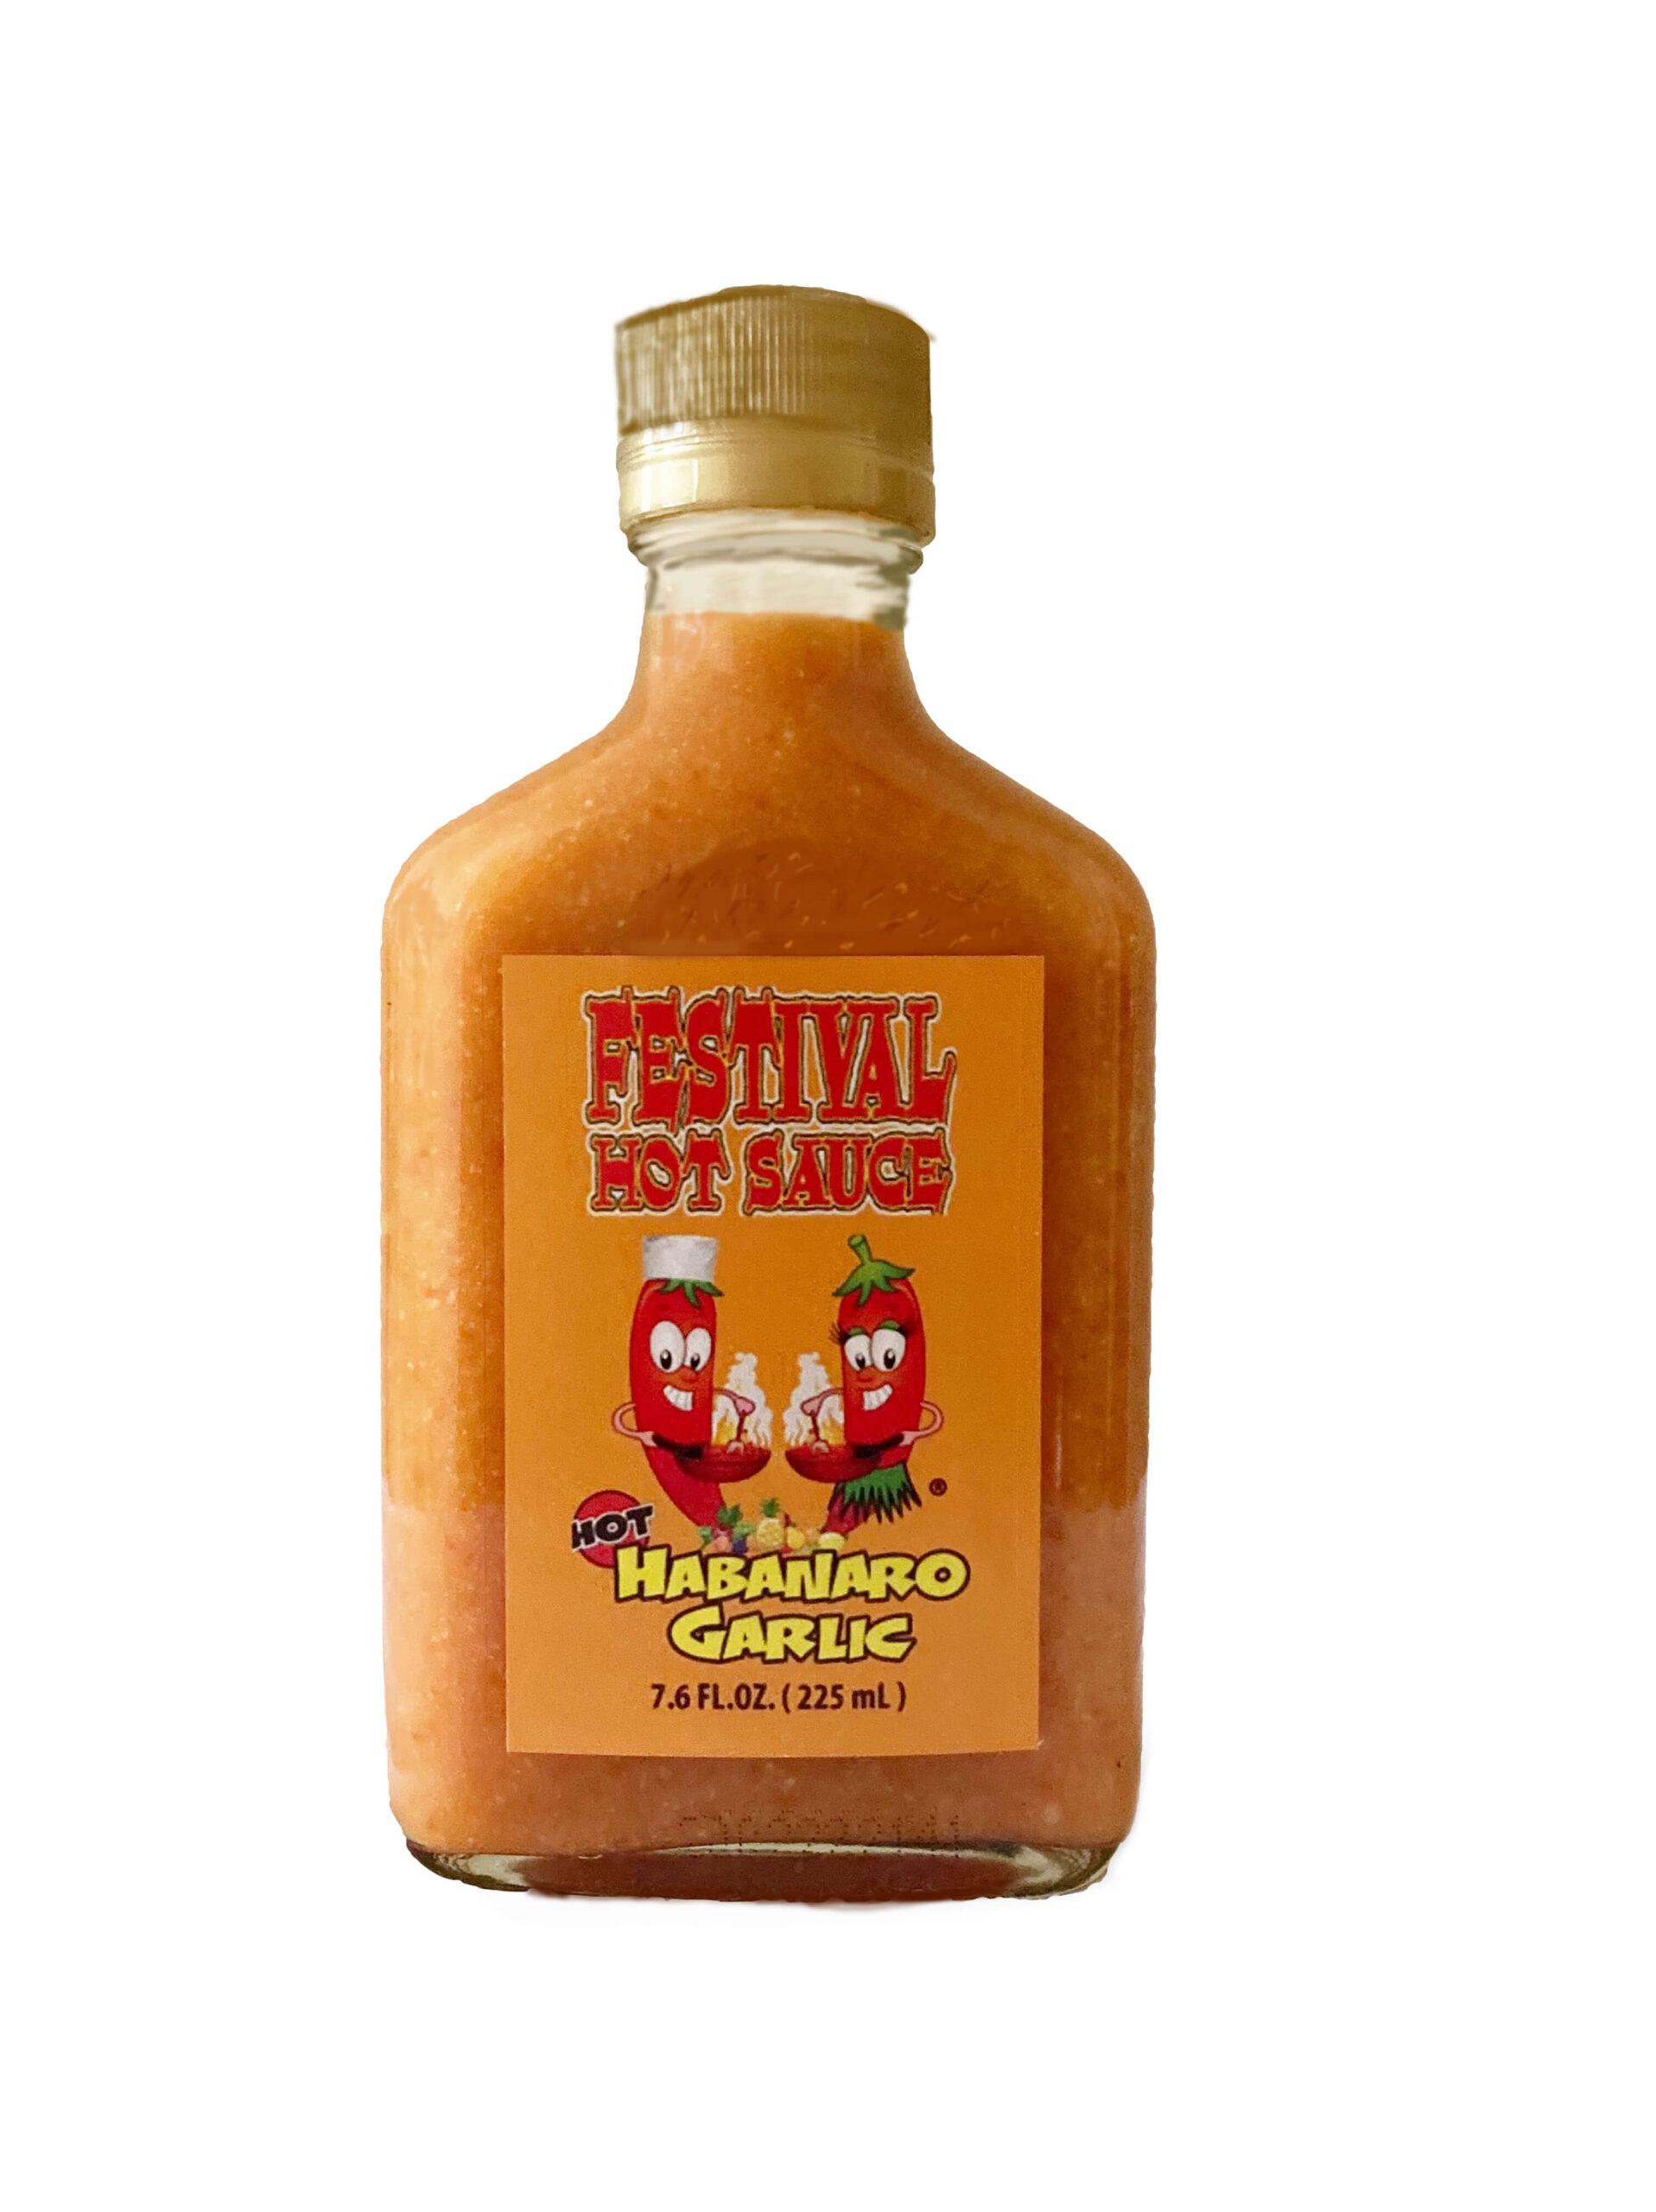 Habanero Garlic Hot Sauce